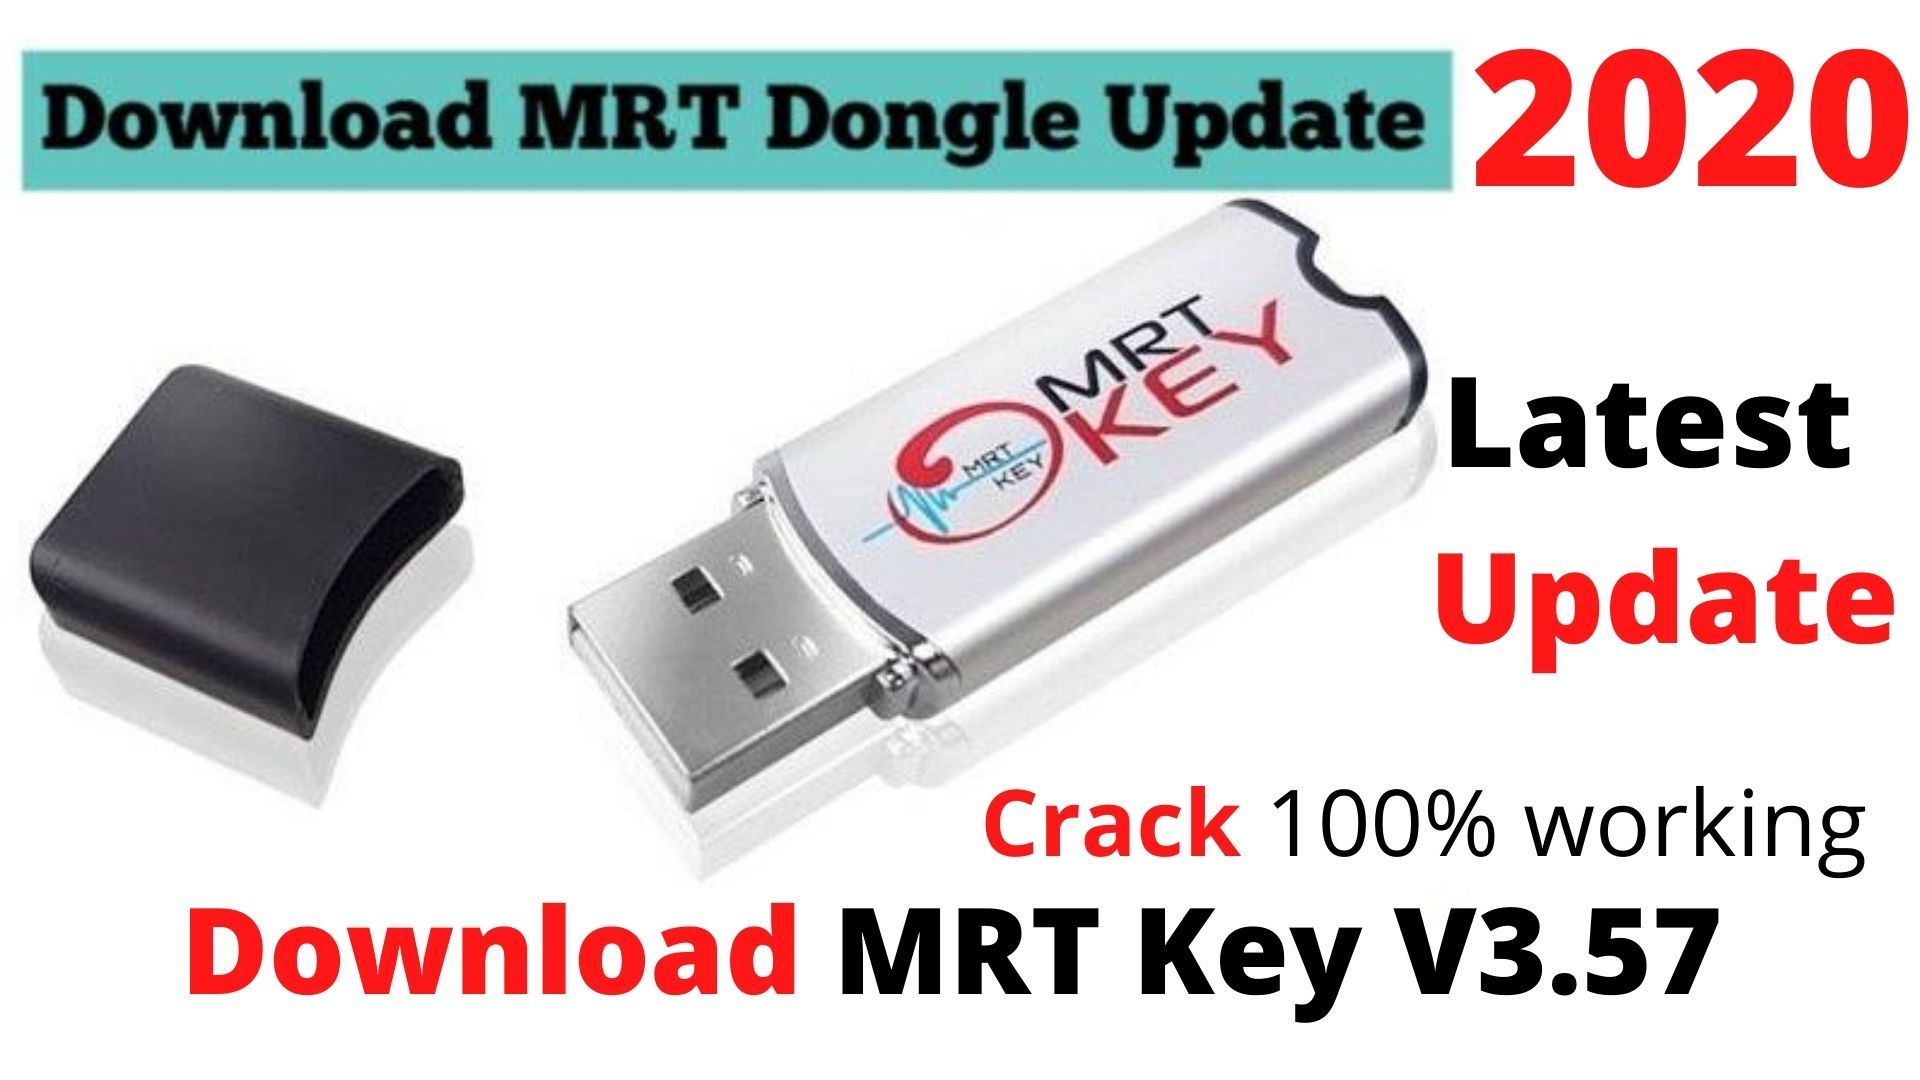 Free Download Mrt Key V3 57 Latest Update Mrt Dongle Setup Free Download Key Download